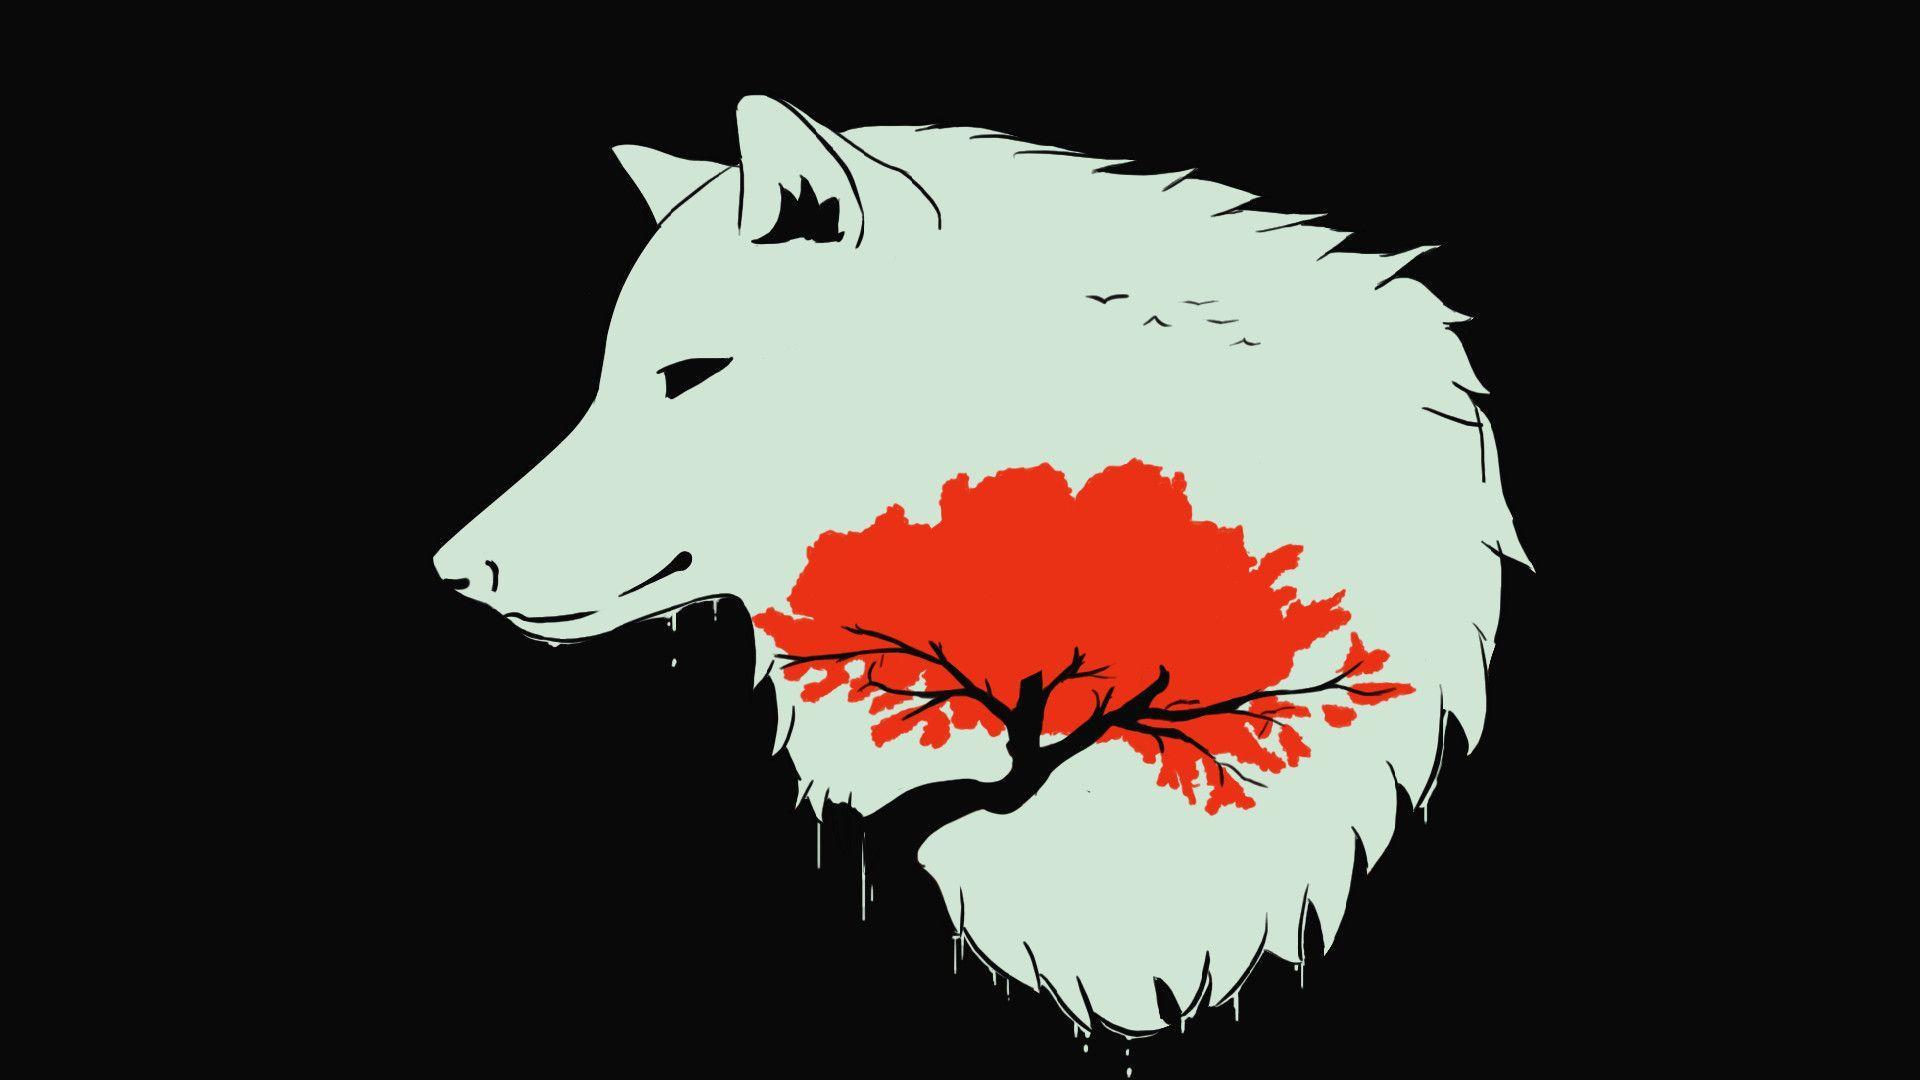 Minimalist Wolf Wallpapers Top Free Minimalist Wolf Backgrounds